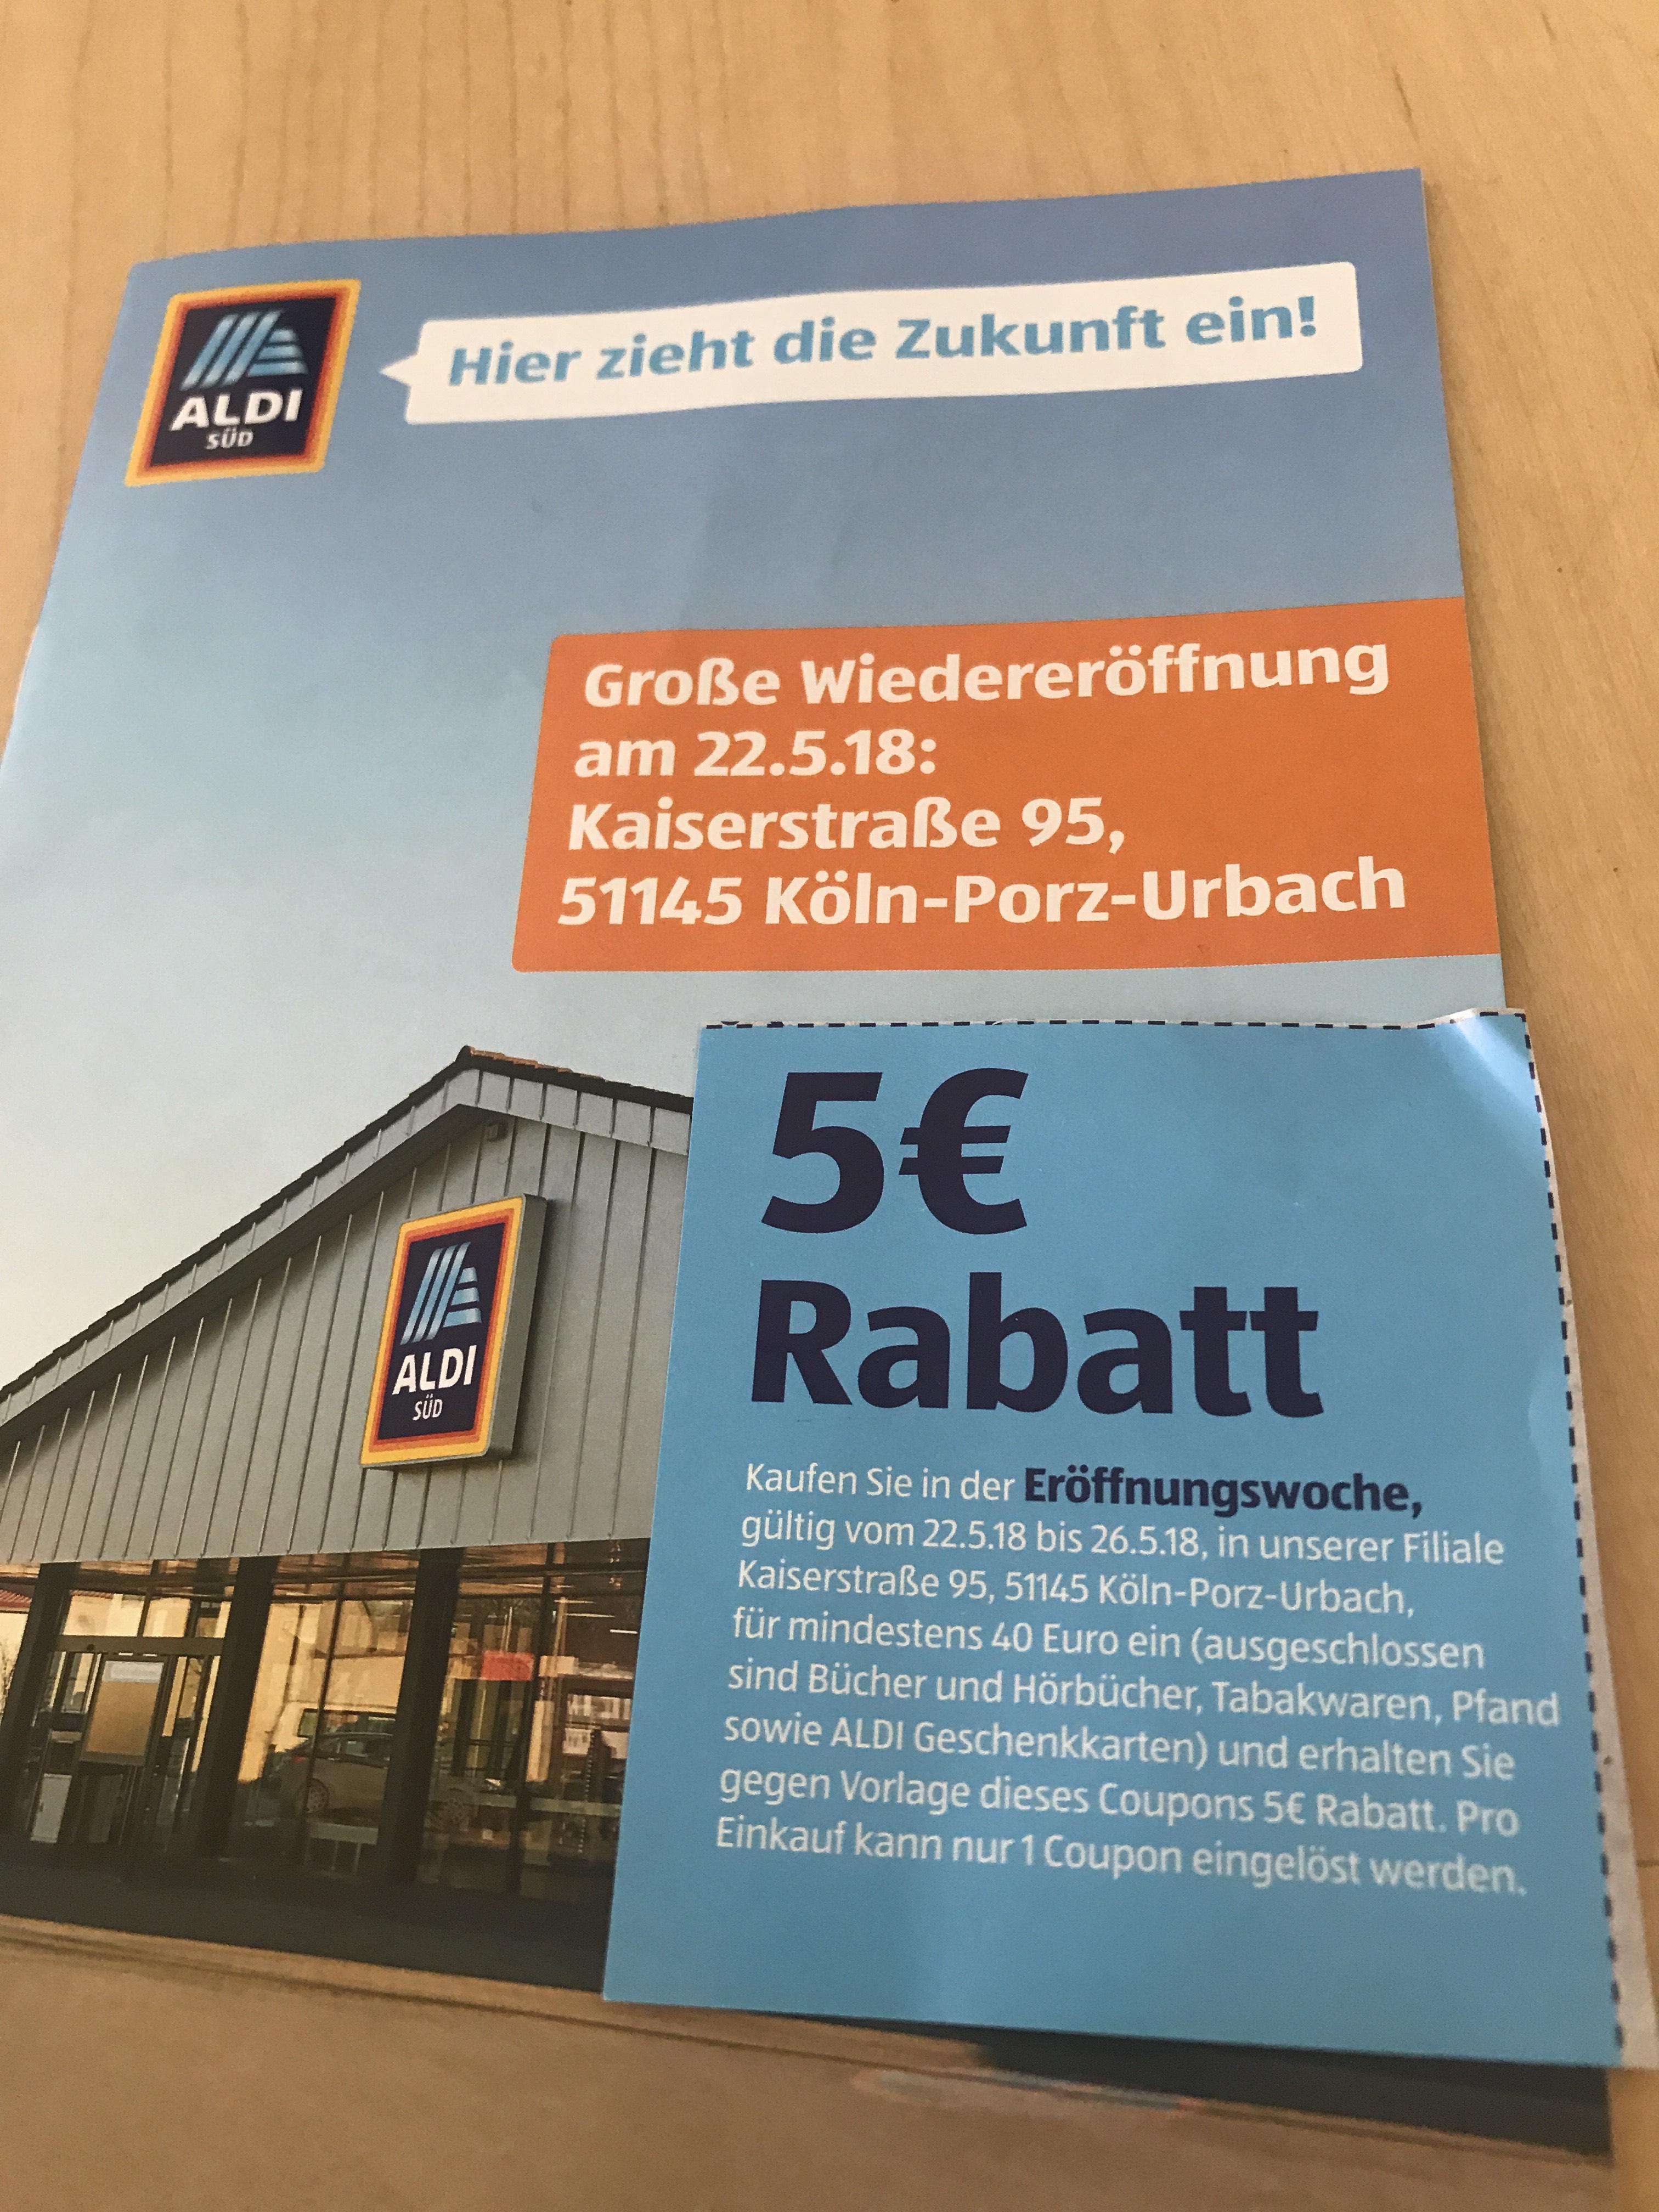 (Lokal) Köln-porz Aldi Süd 5€ Rabatt mindestens 40€ Einkauf